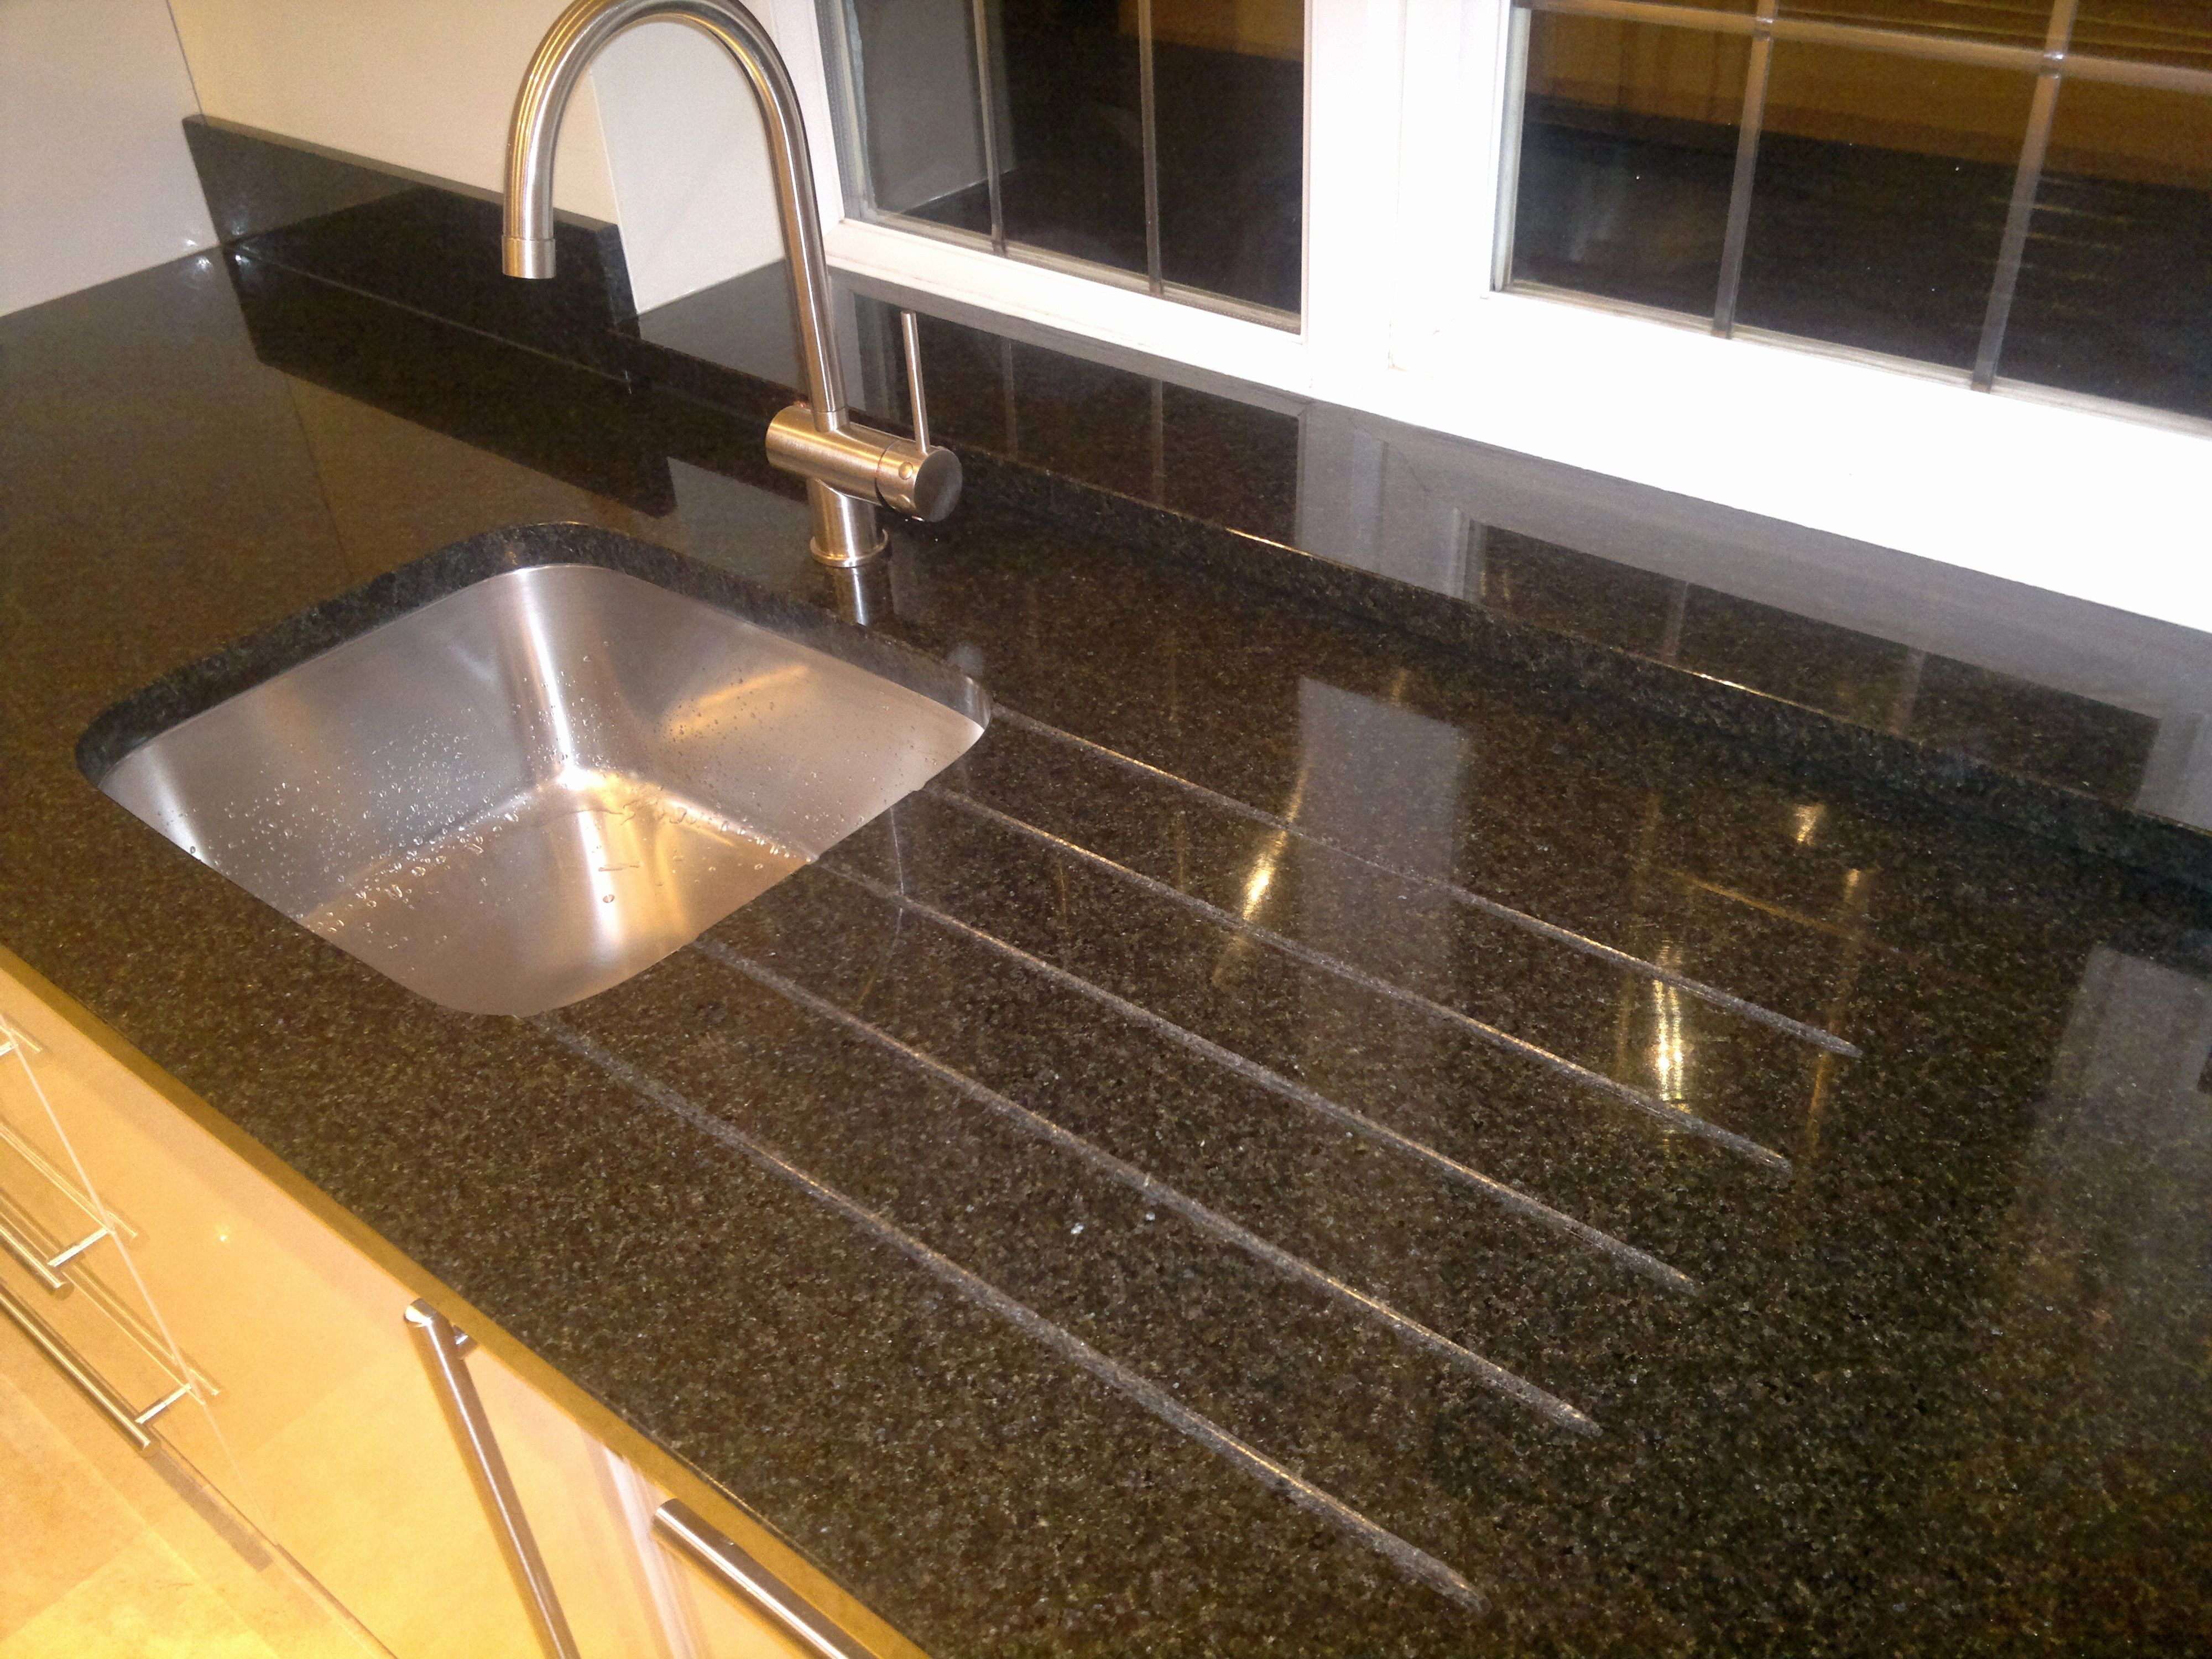 inspirational new kitchen sink installation check more at https rh pinterest com